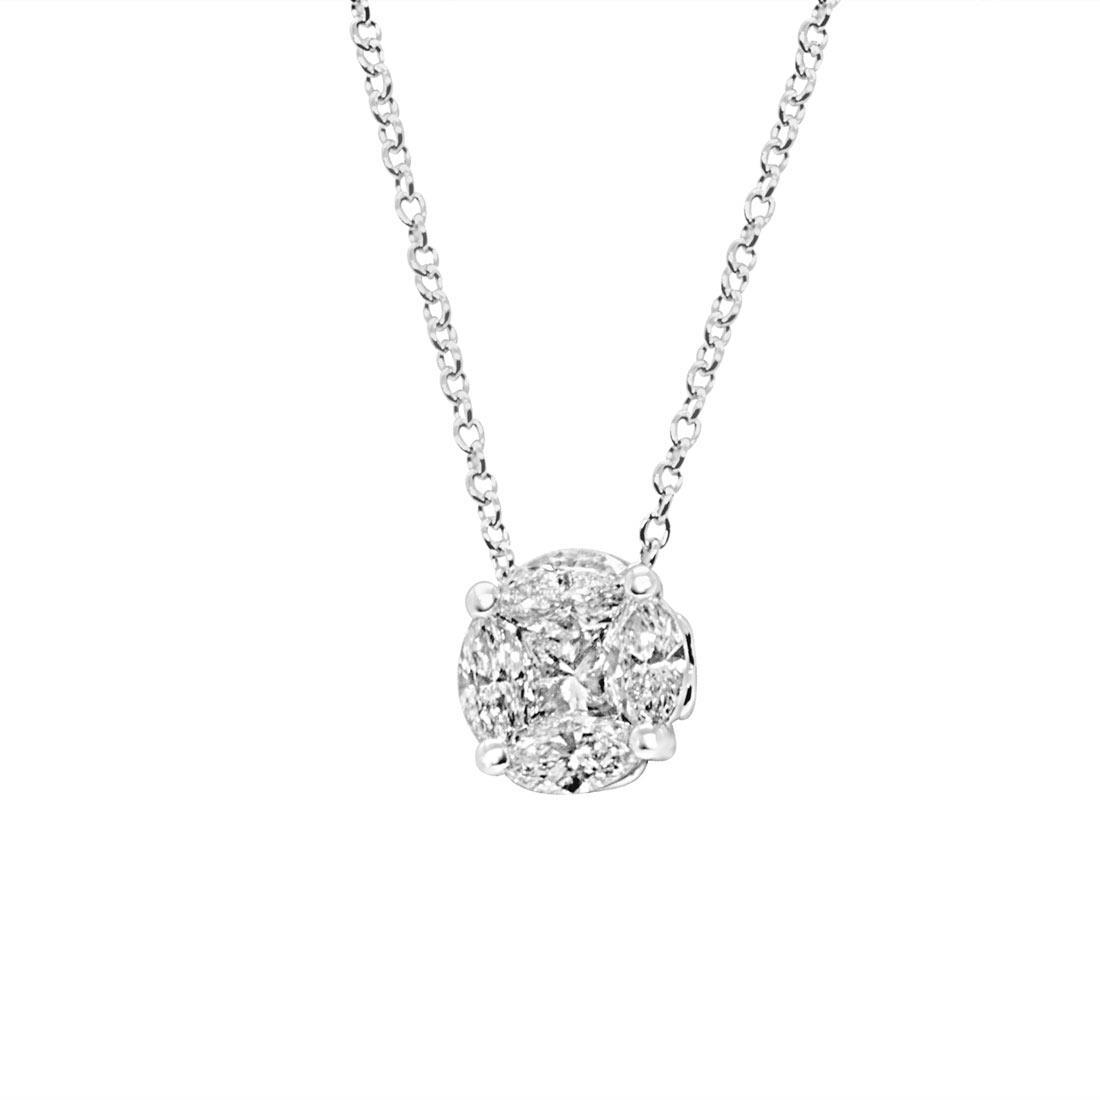 Collana punto luce con diamanti 0,80 ct - ALFIERI ST JOHN